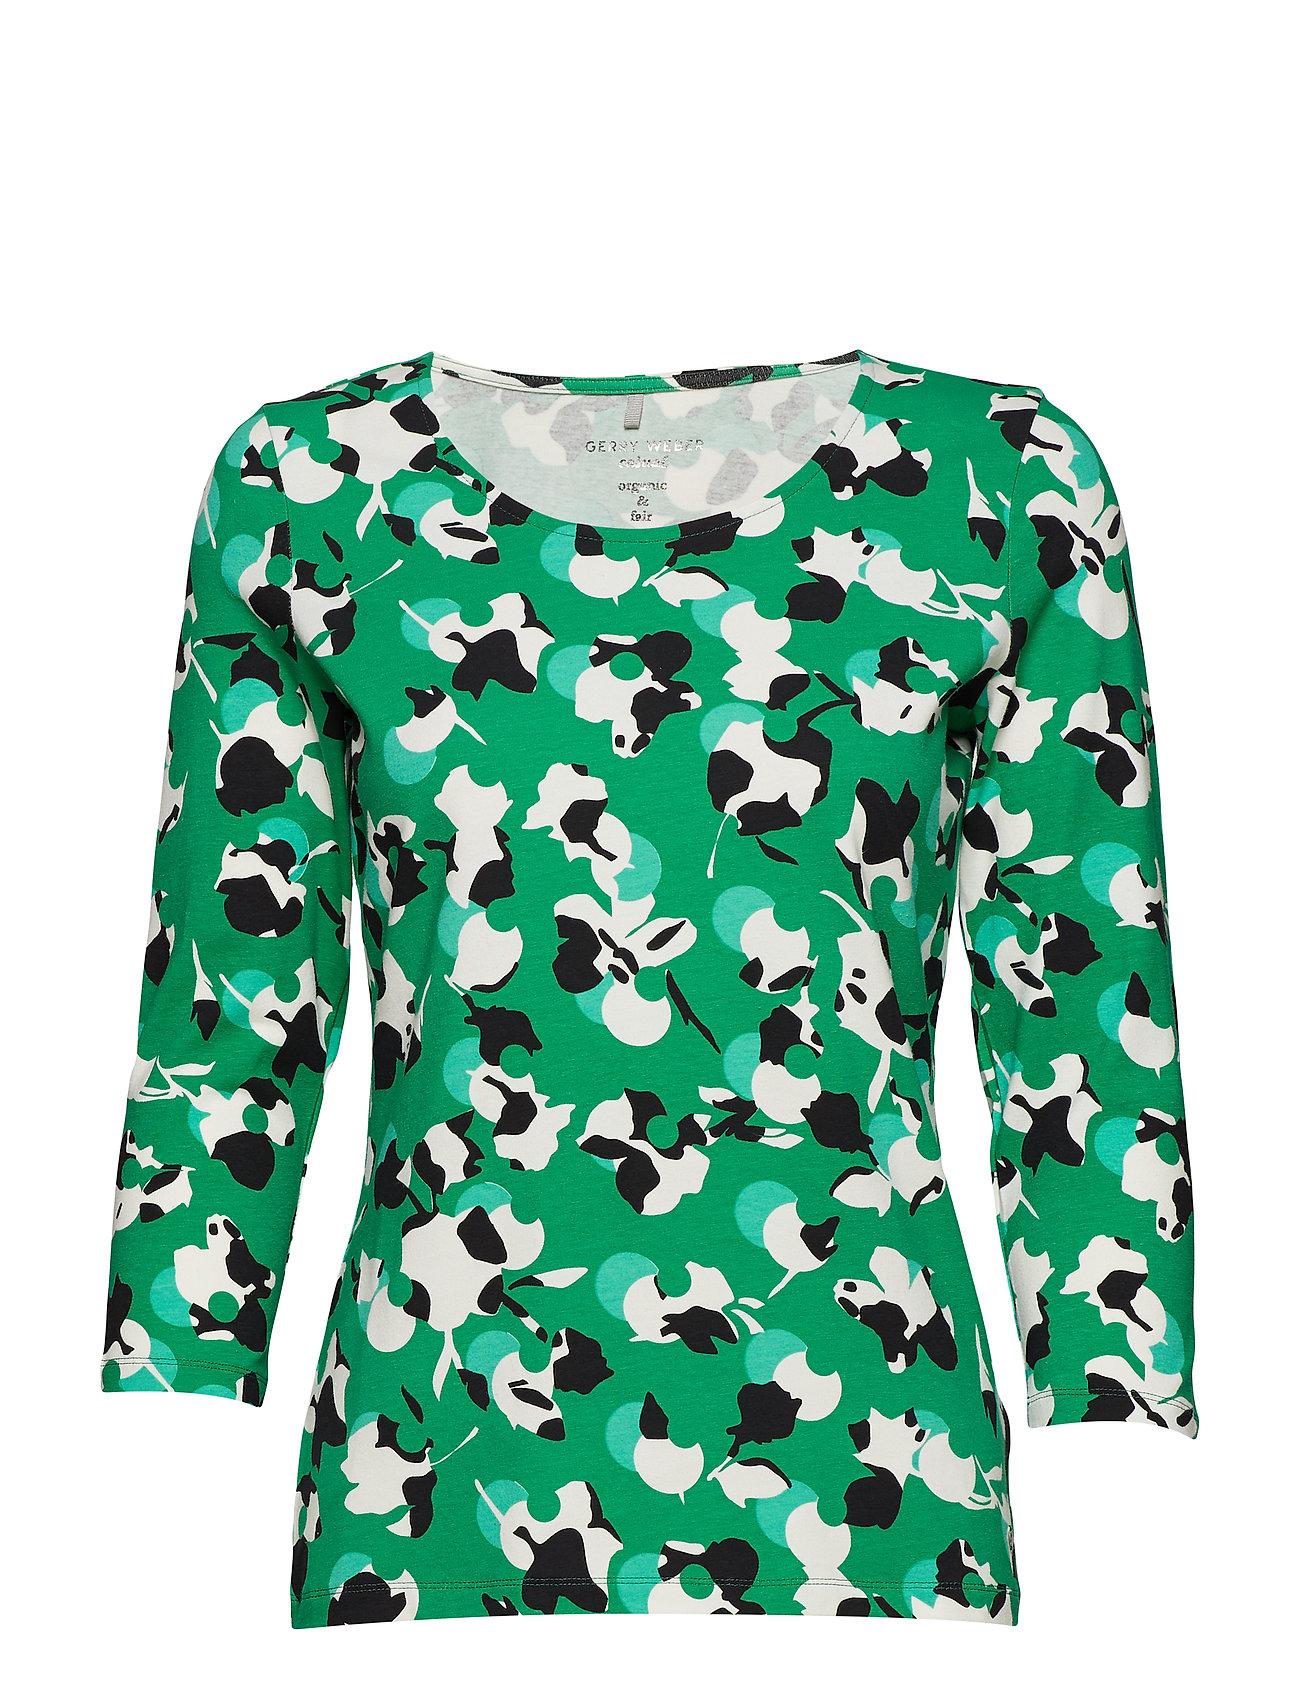 Image of T-Shirt 3/4-Sleeve R Langærmet T-shirt Grøn GERRY WEBER EDITION (3094064895)